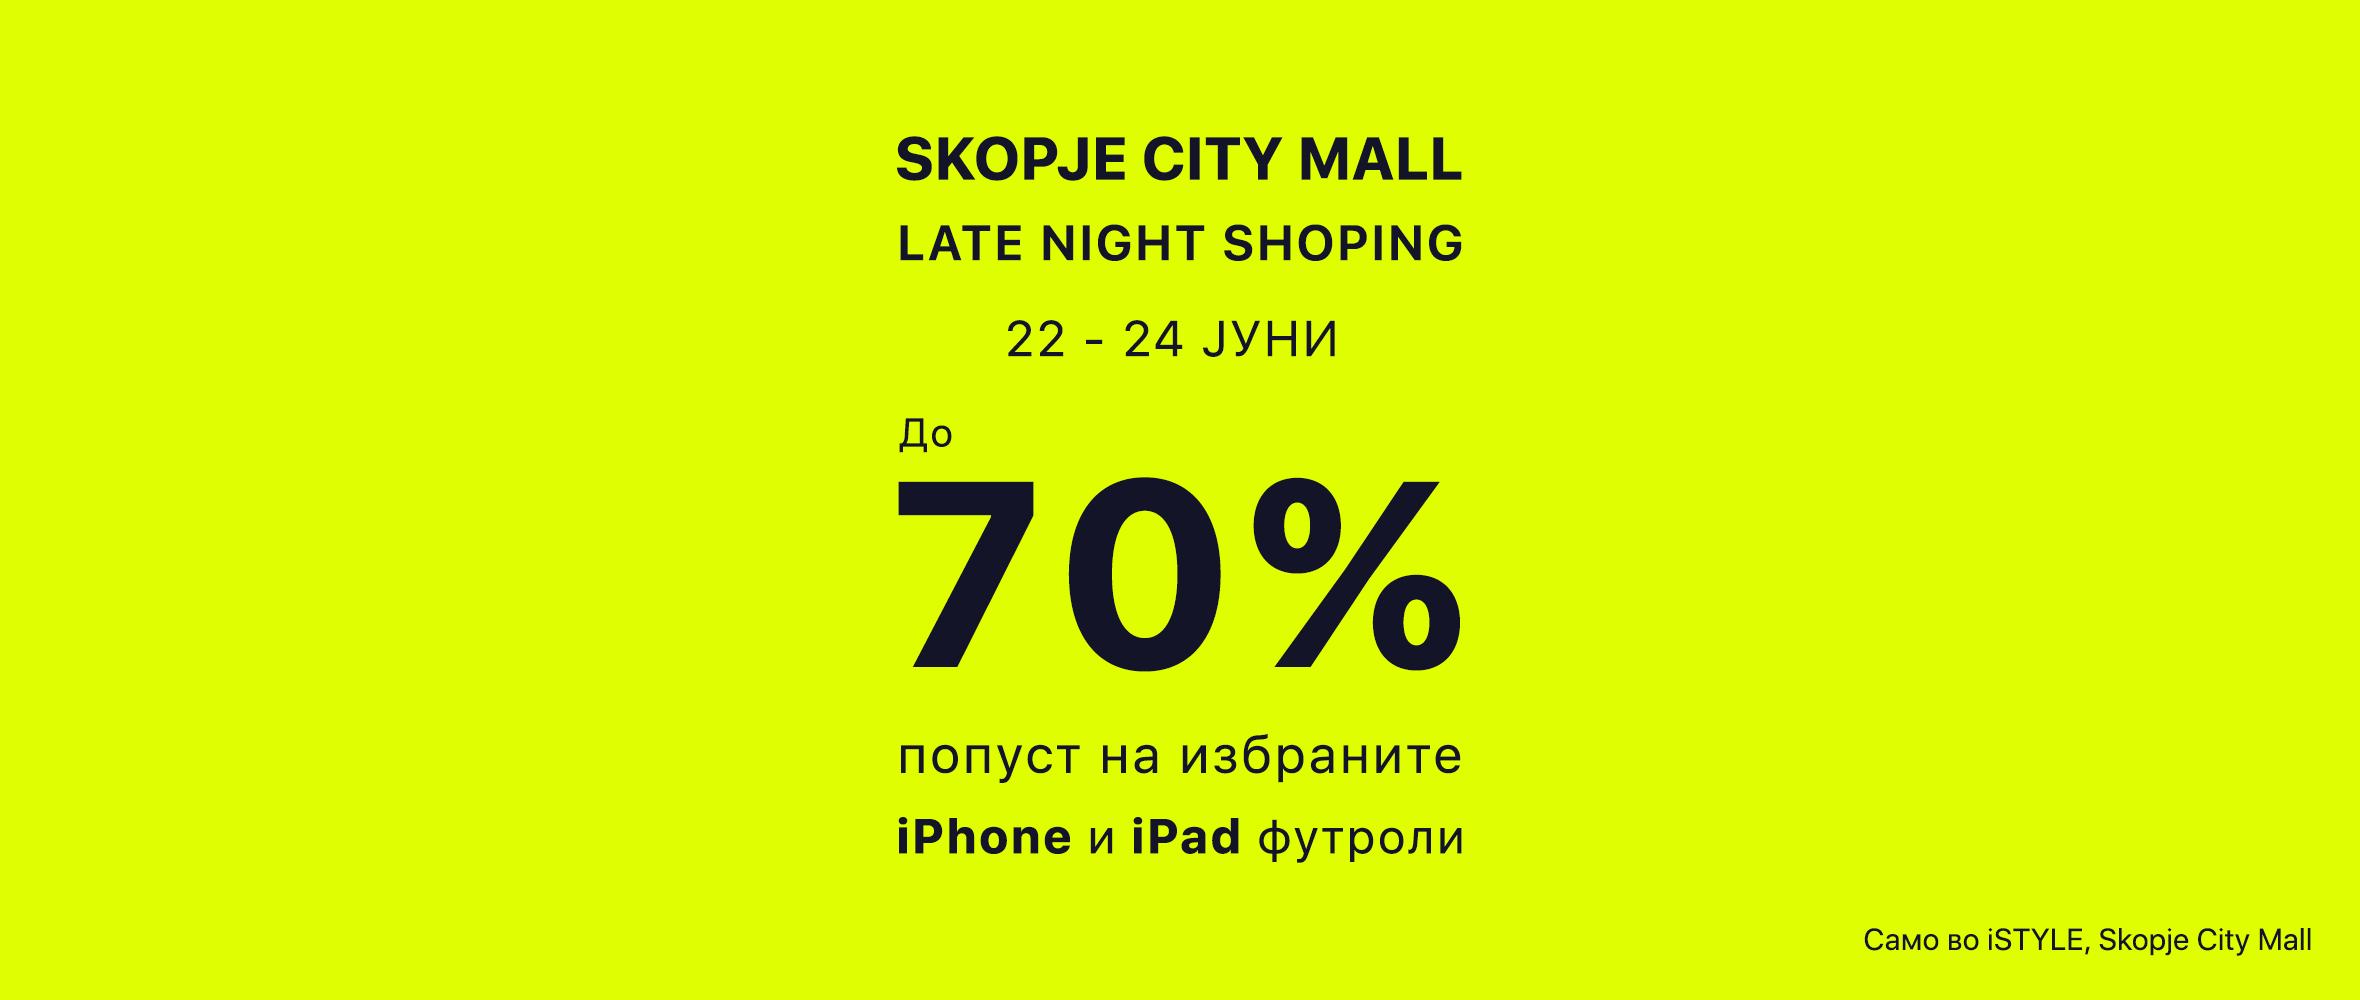 City Mall - Late Night Shoping